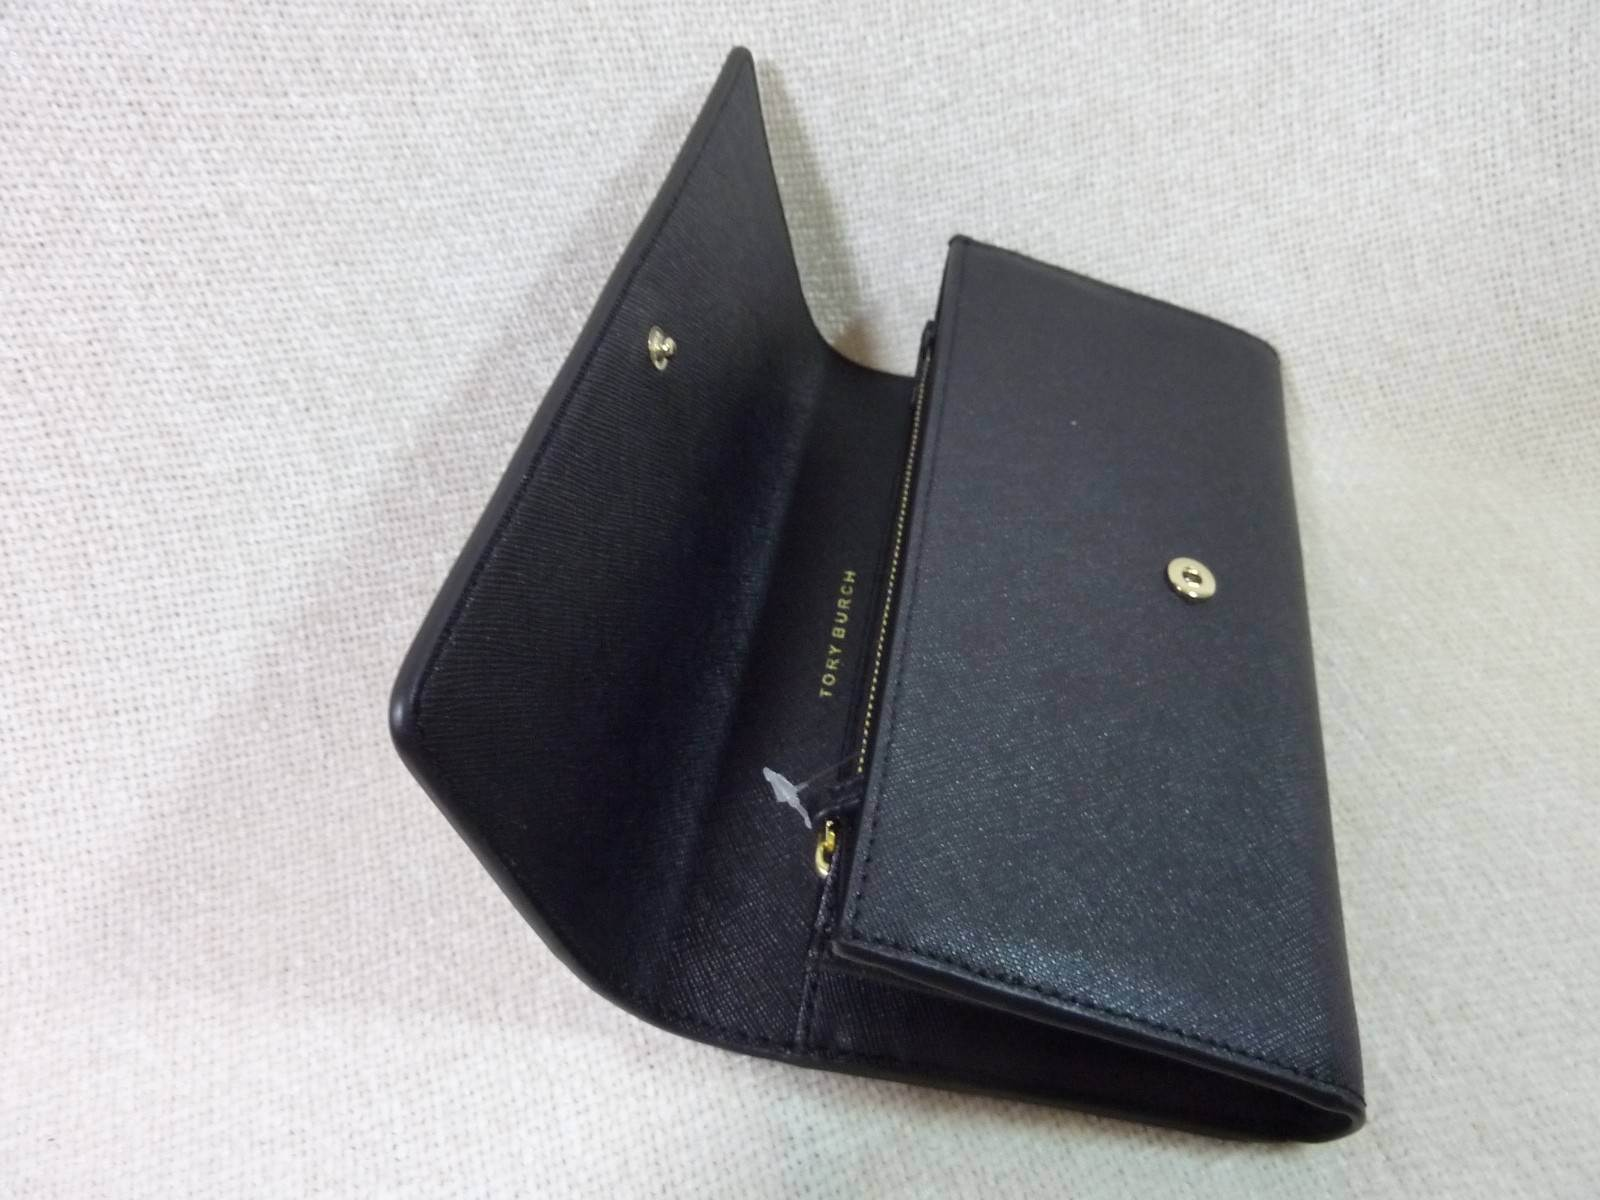 NWT Tory Burch Classic Black Saffiano Robinson Middy Satchel + Wallet $800 image 11